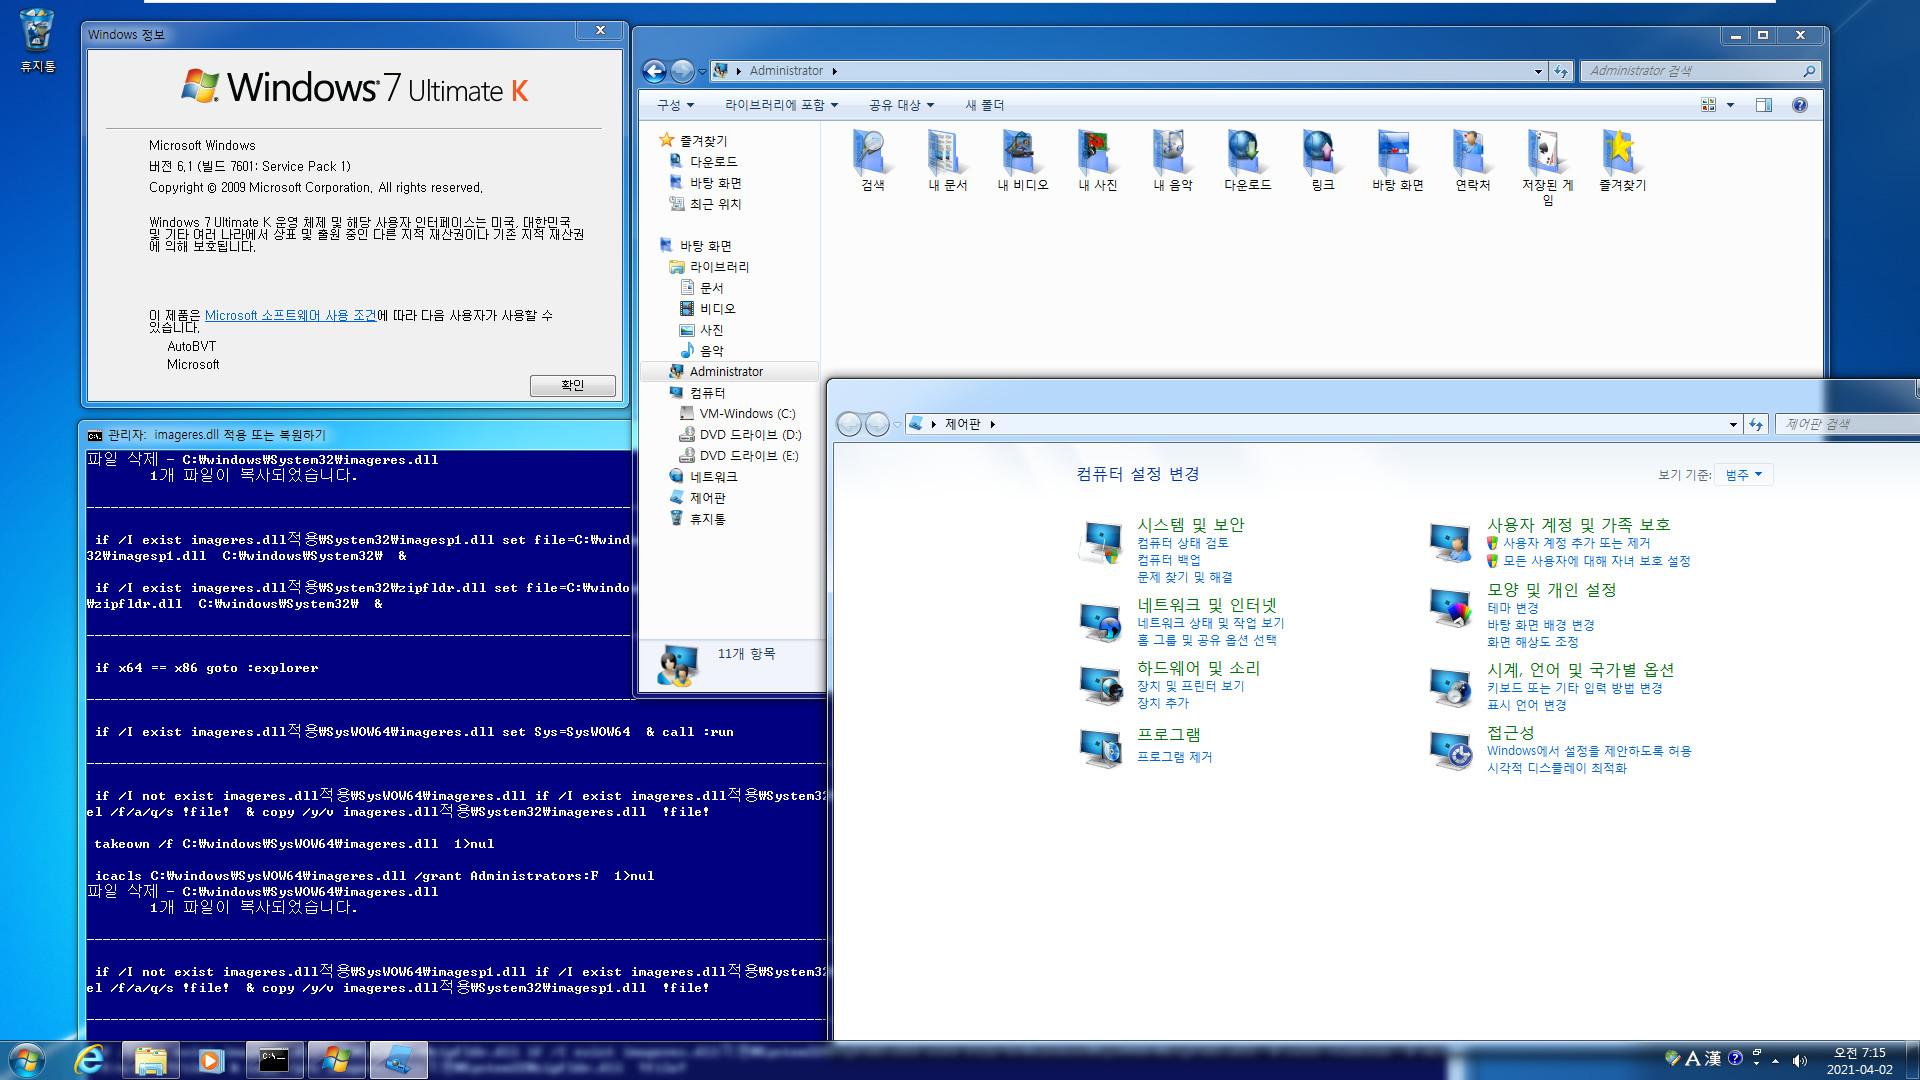 imageres.dll 2개를 합친 파일 테스트 - 윈도우 10 버전 20H2와 버전 1903과 버전 1809와 윈도우 7에서는 재부팅 통과 2021-04-02_071518.jpg